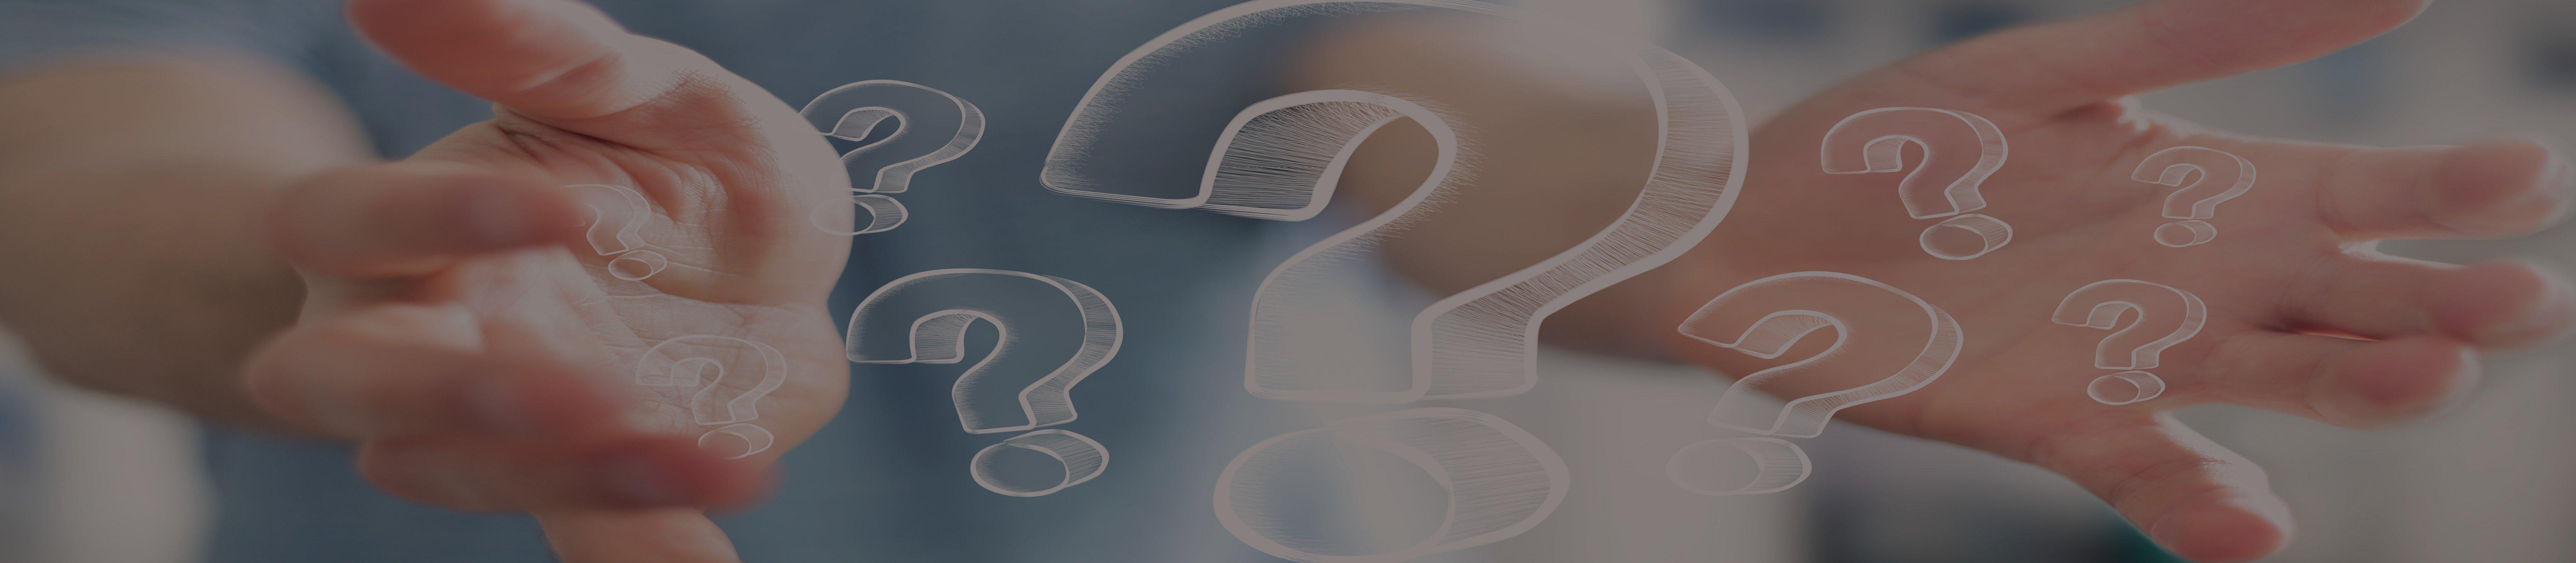 FAQ Banner-1